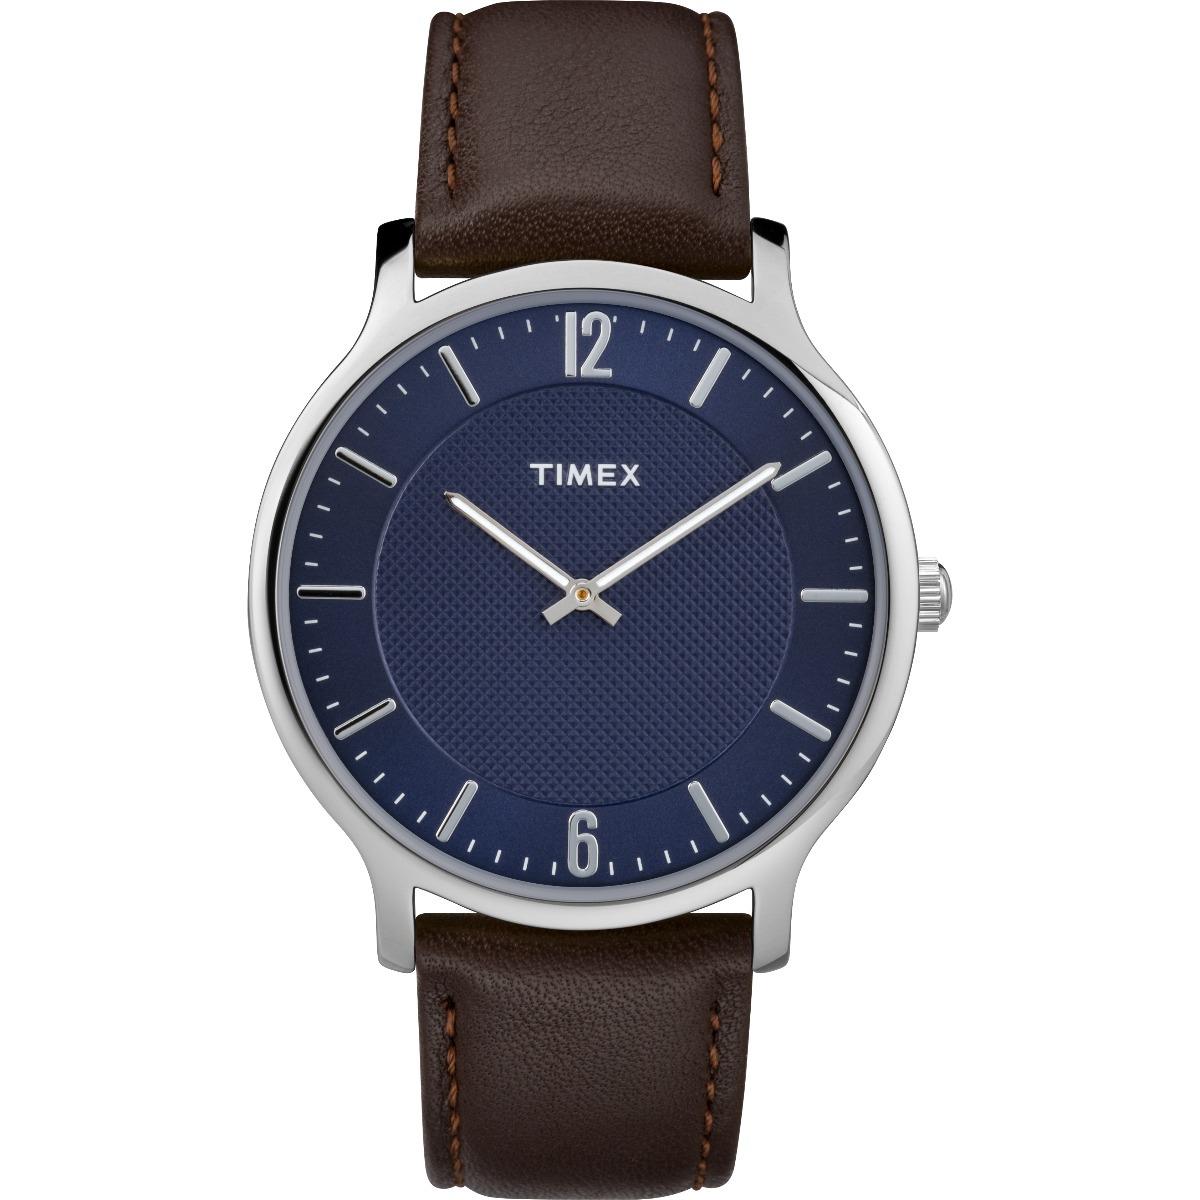 Metropolitan Hombre Timex Reloj Tw2r49900 Caféplateadoazul 3A5j4RLq